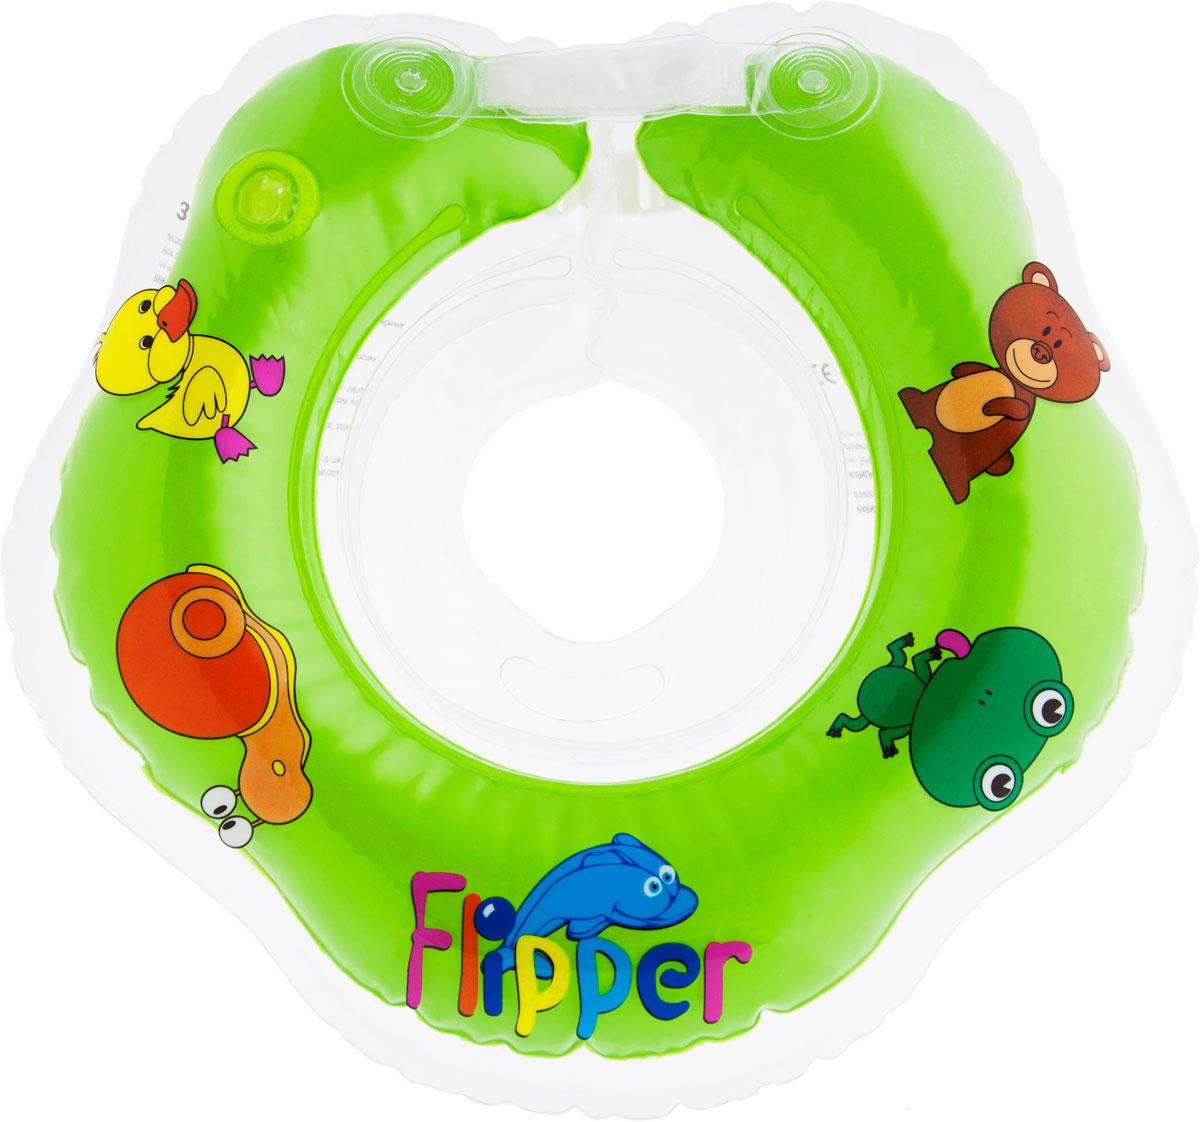 Круг на шею для купания Roxy-Kids Flipper, цвет: зеленый